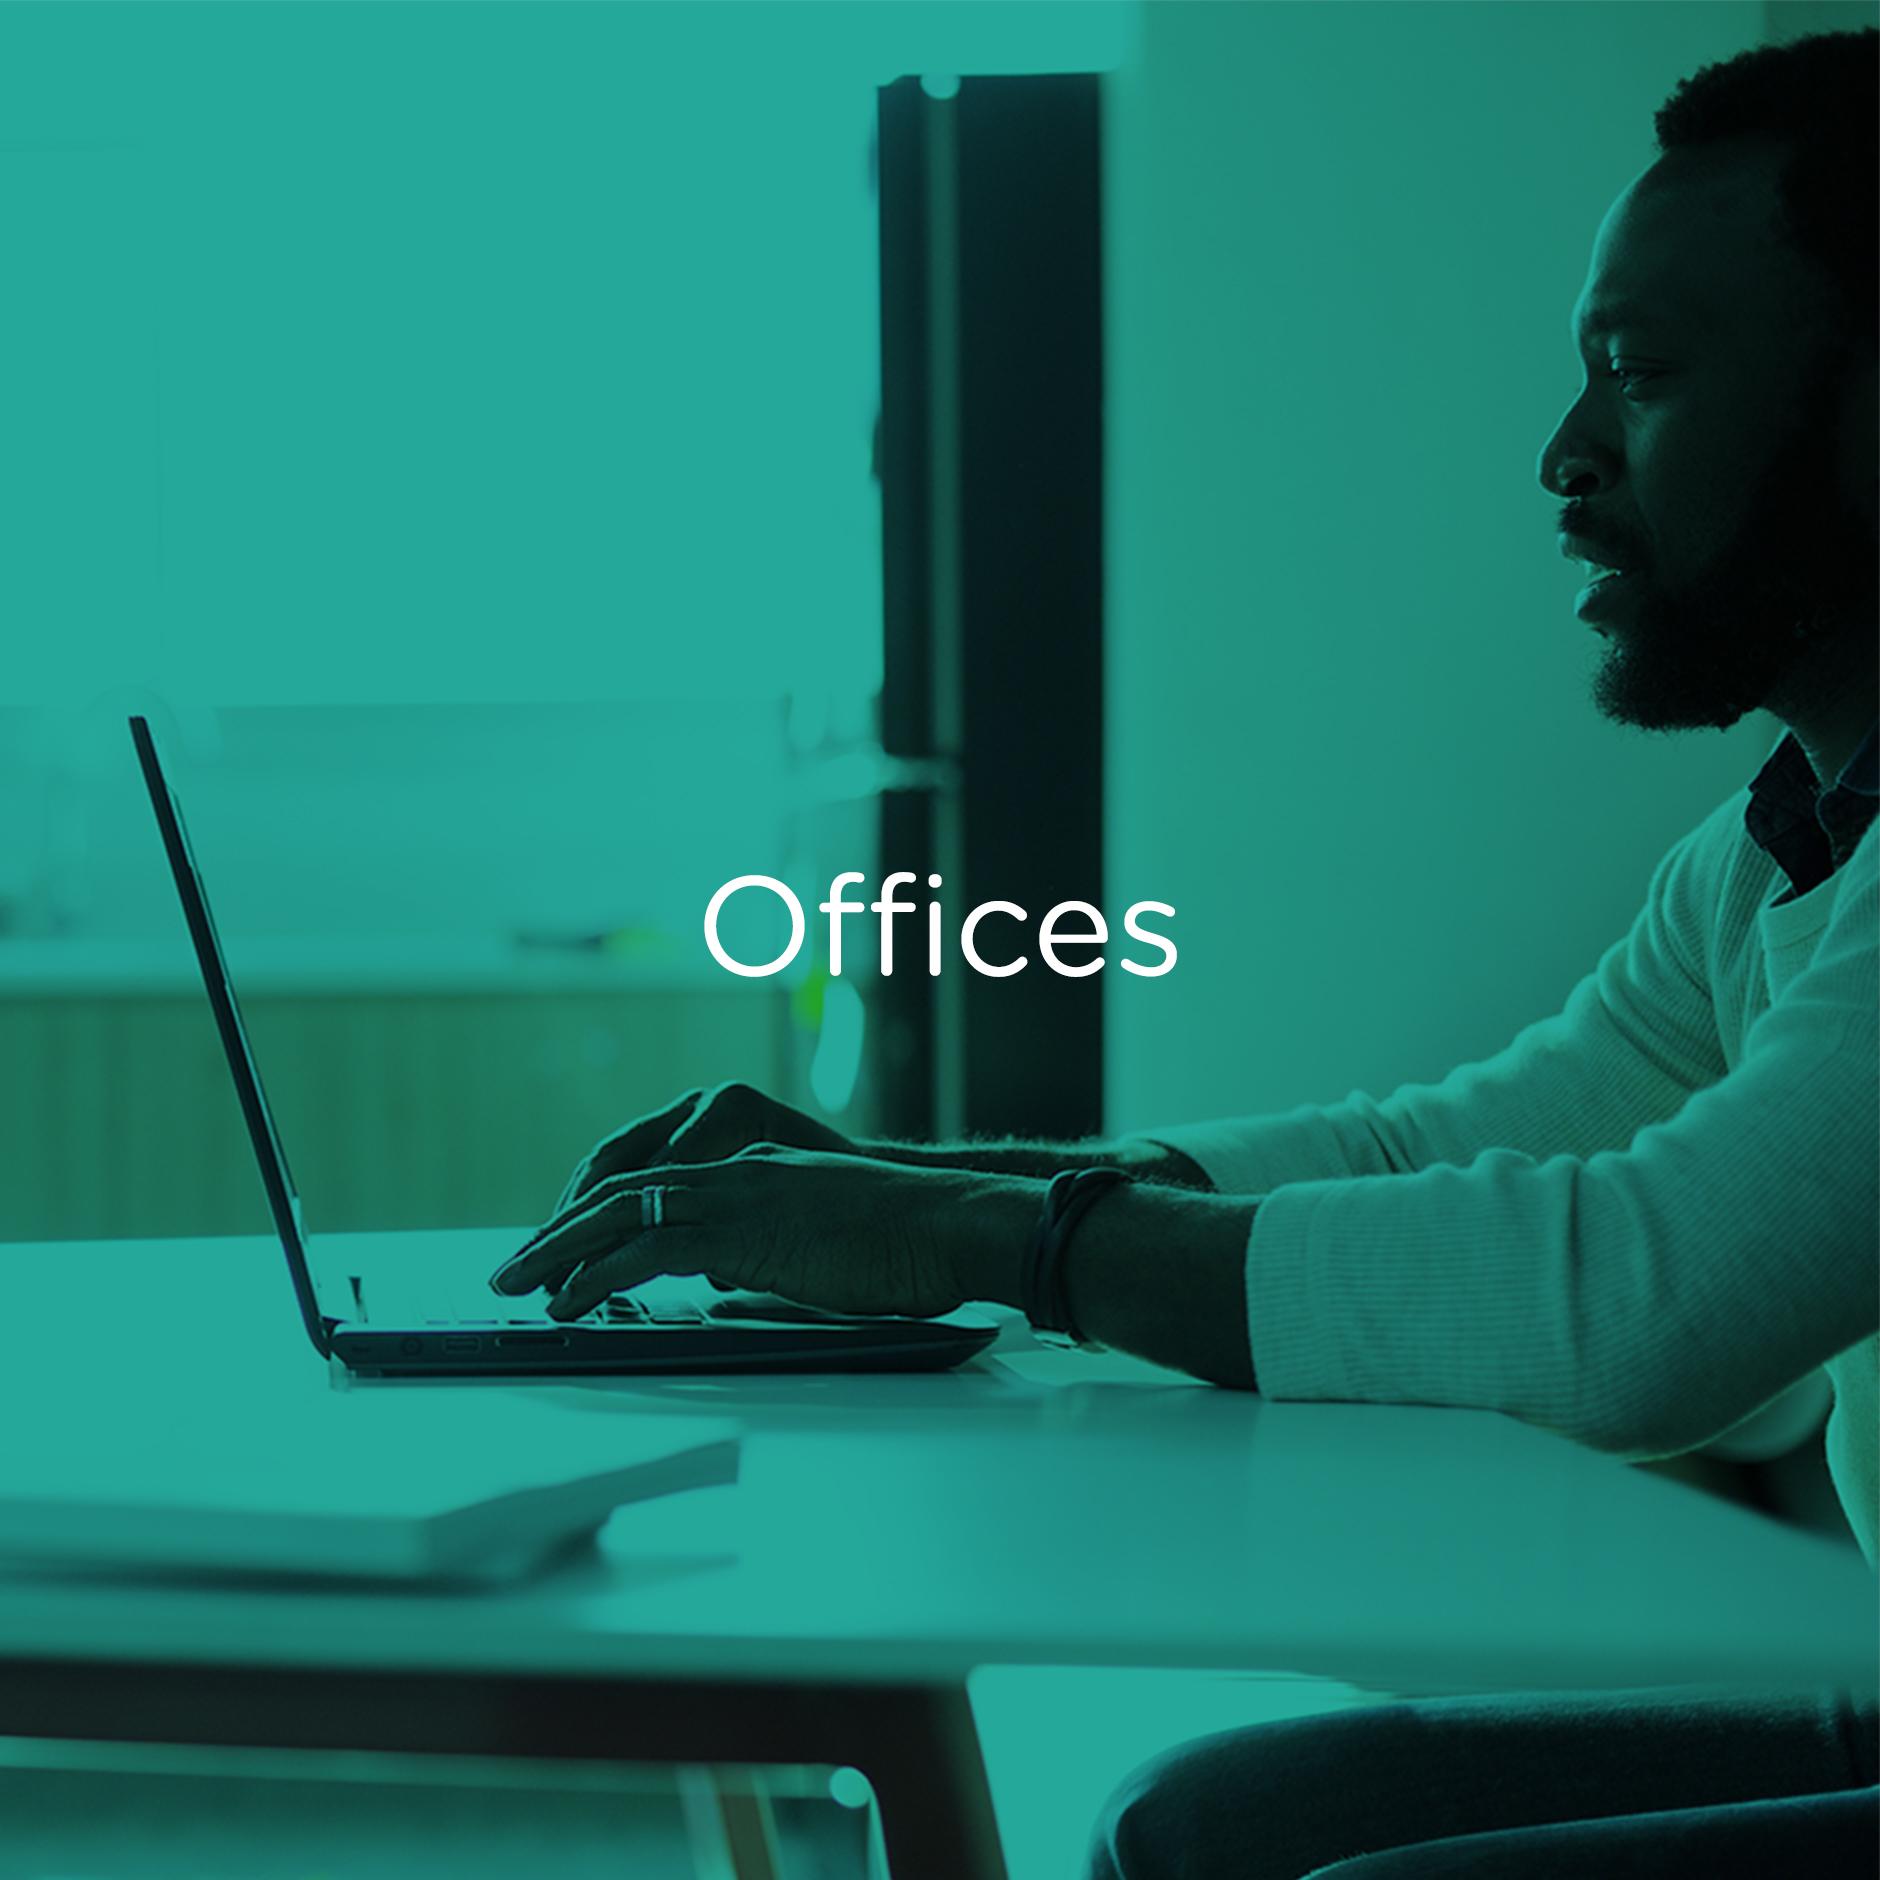 offices_940x940@2x.jpg